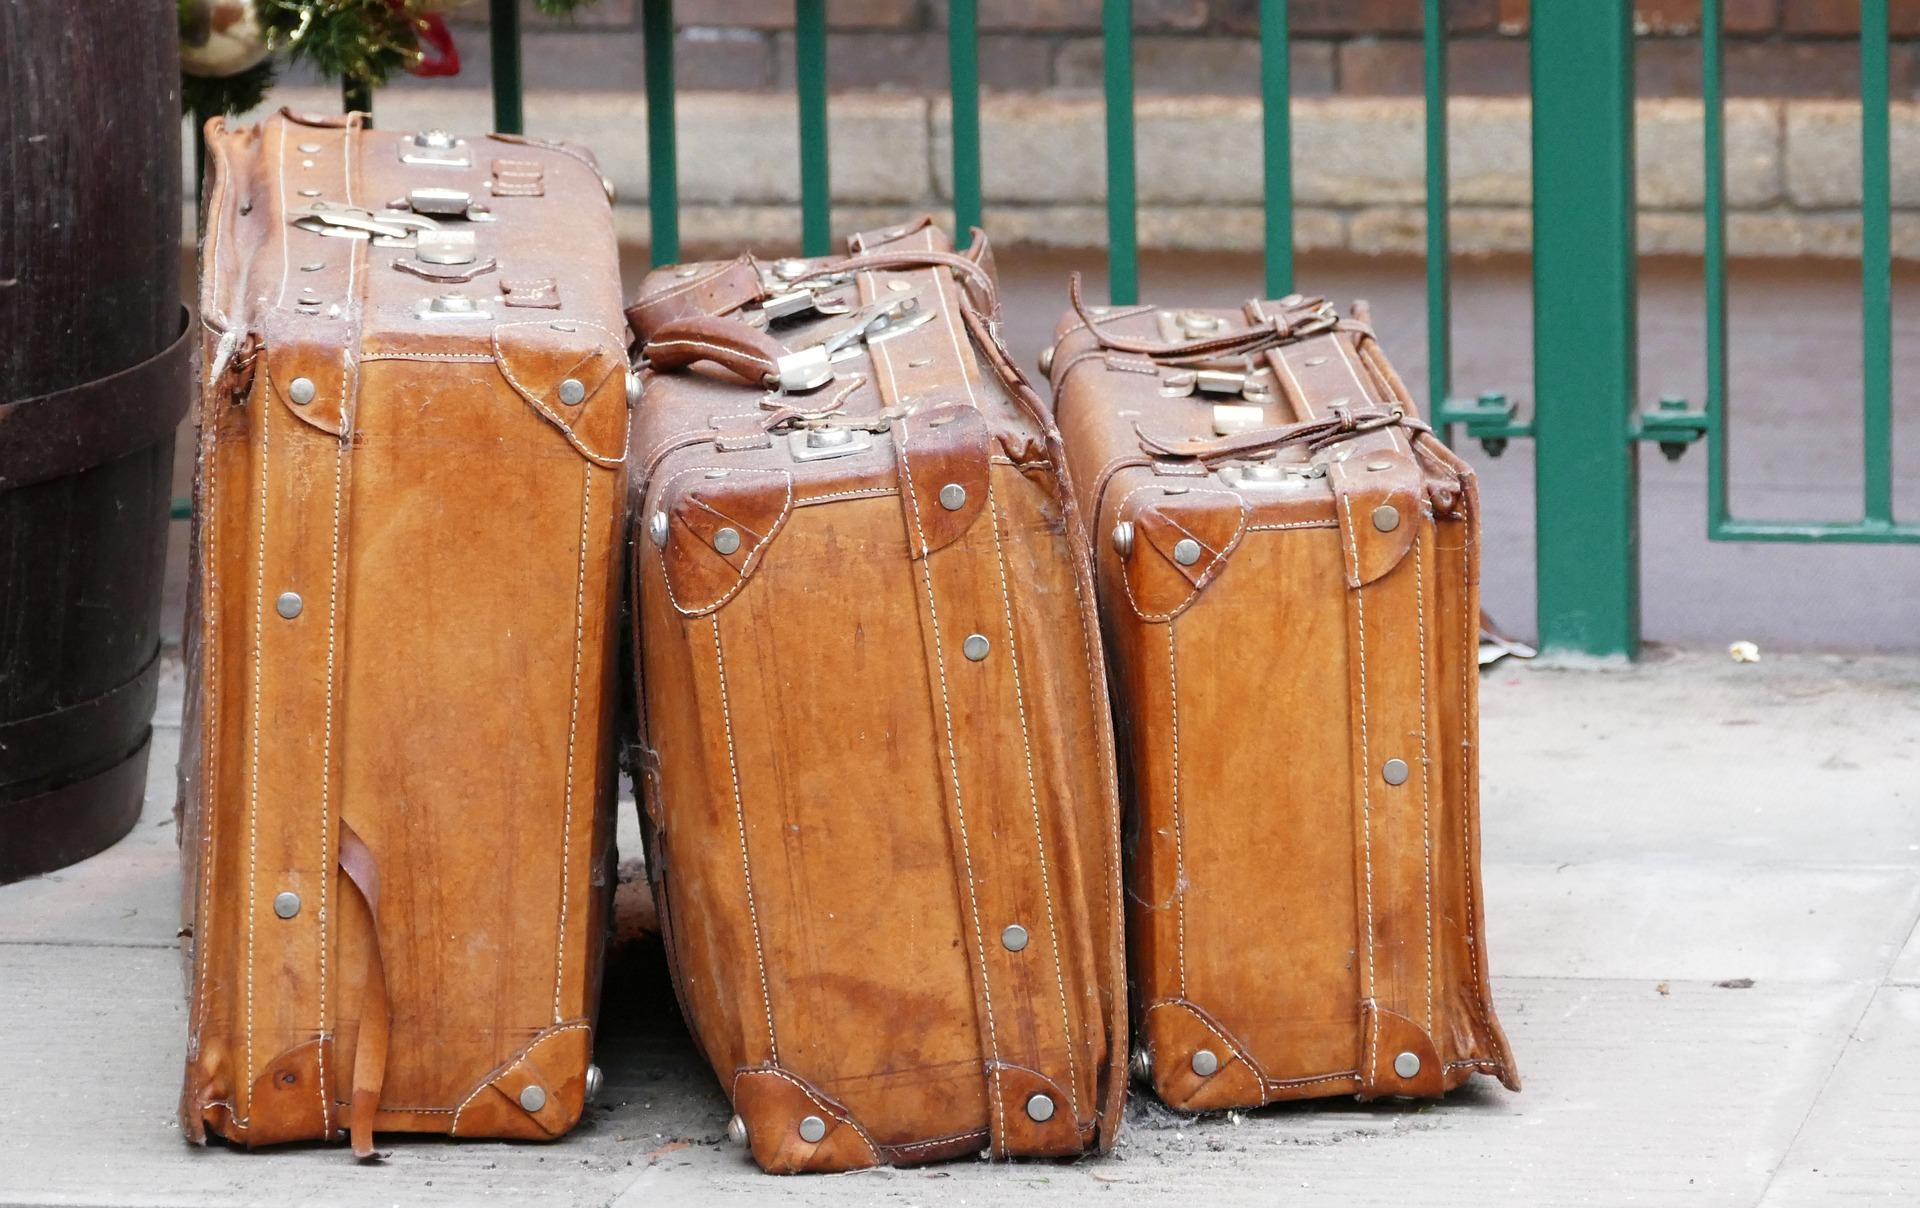 luggage-1950628_1920.jpg